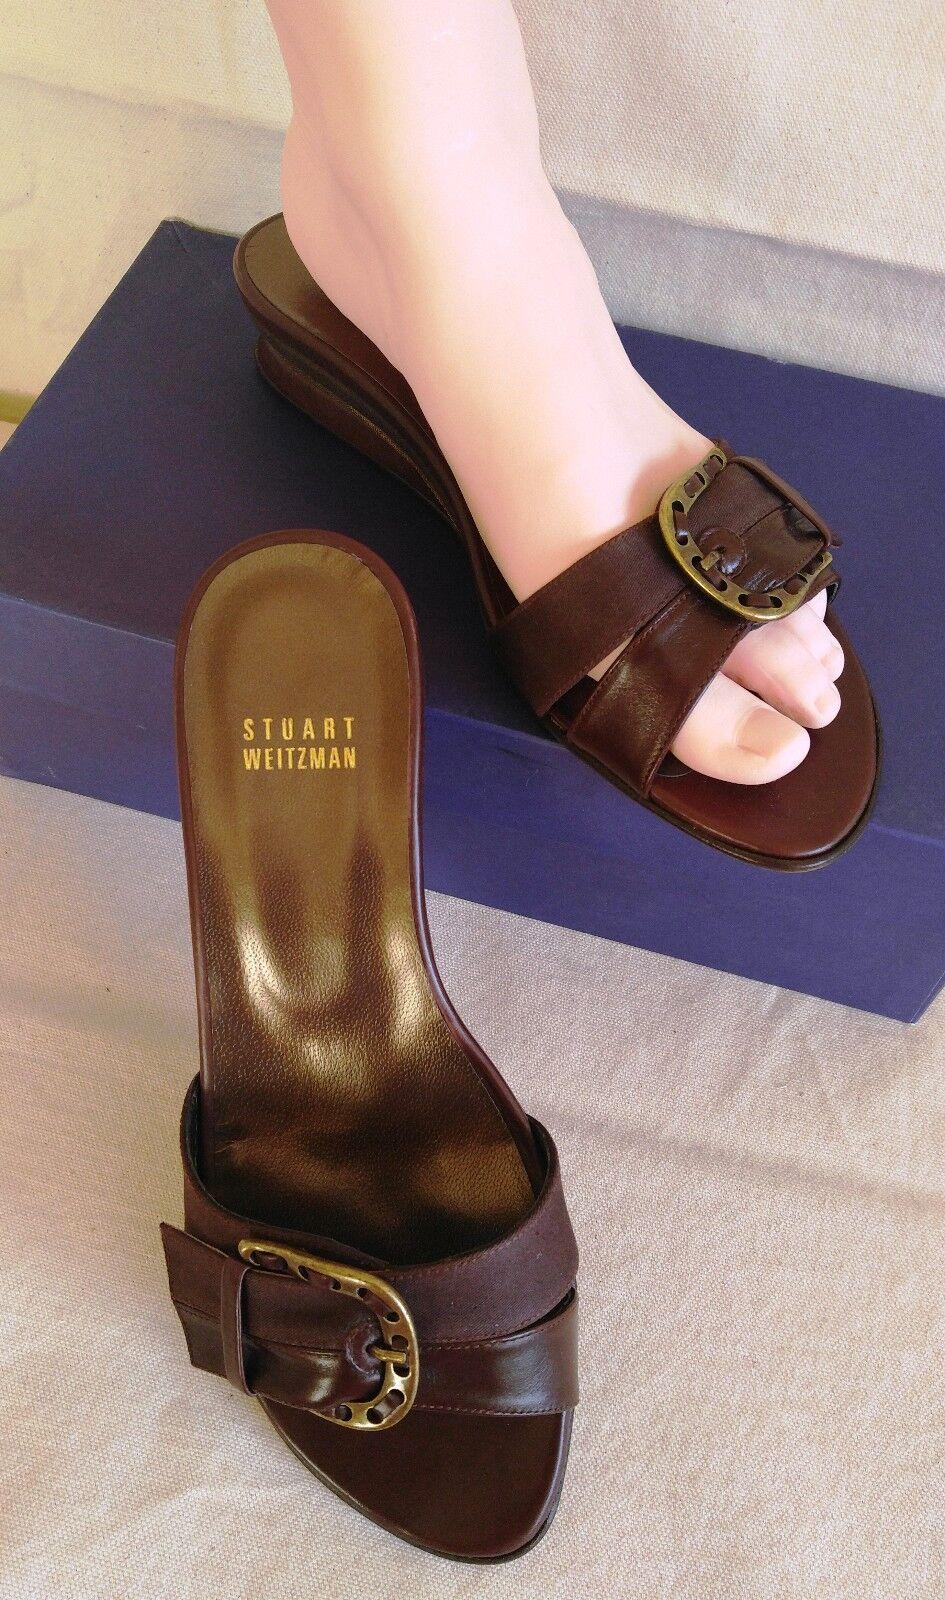 STUART WEITZMAN Fflip Flops Braun Leder Schuhes Bronze Metal Buckle Sz 7 W Wedge